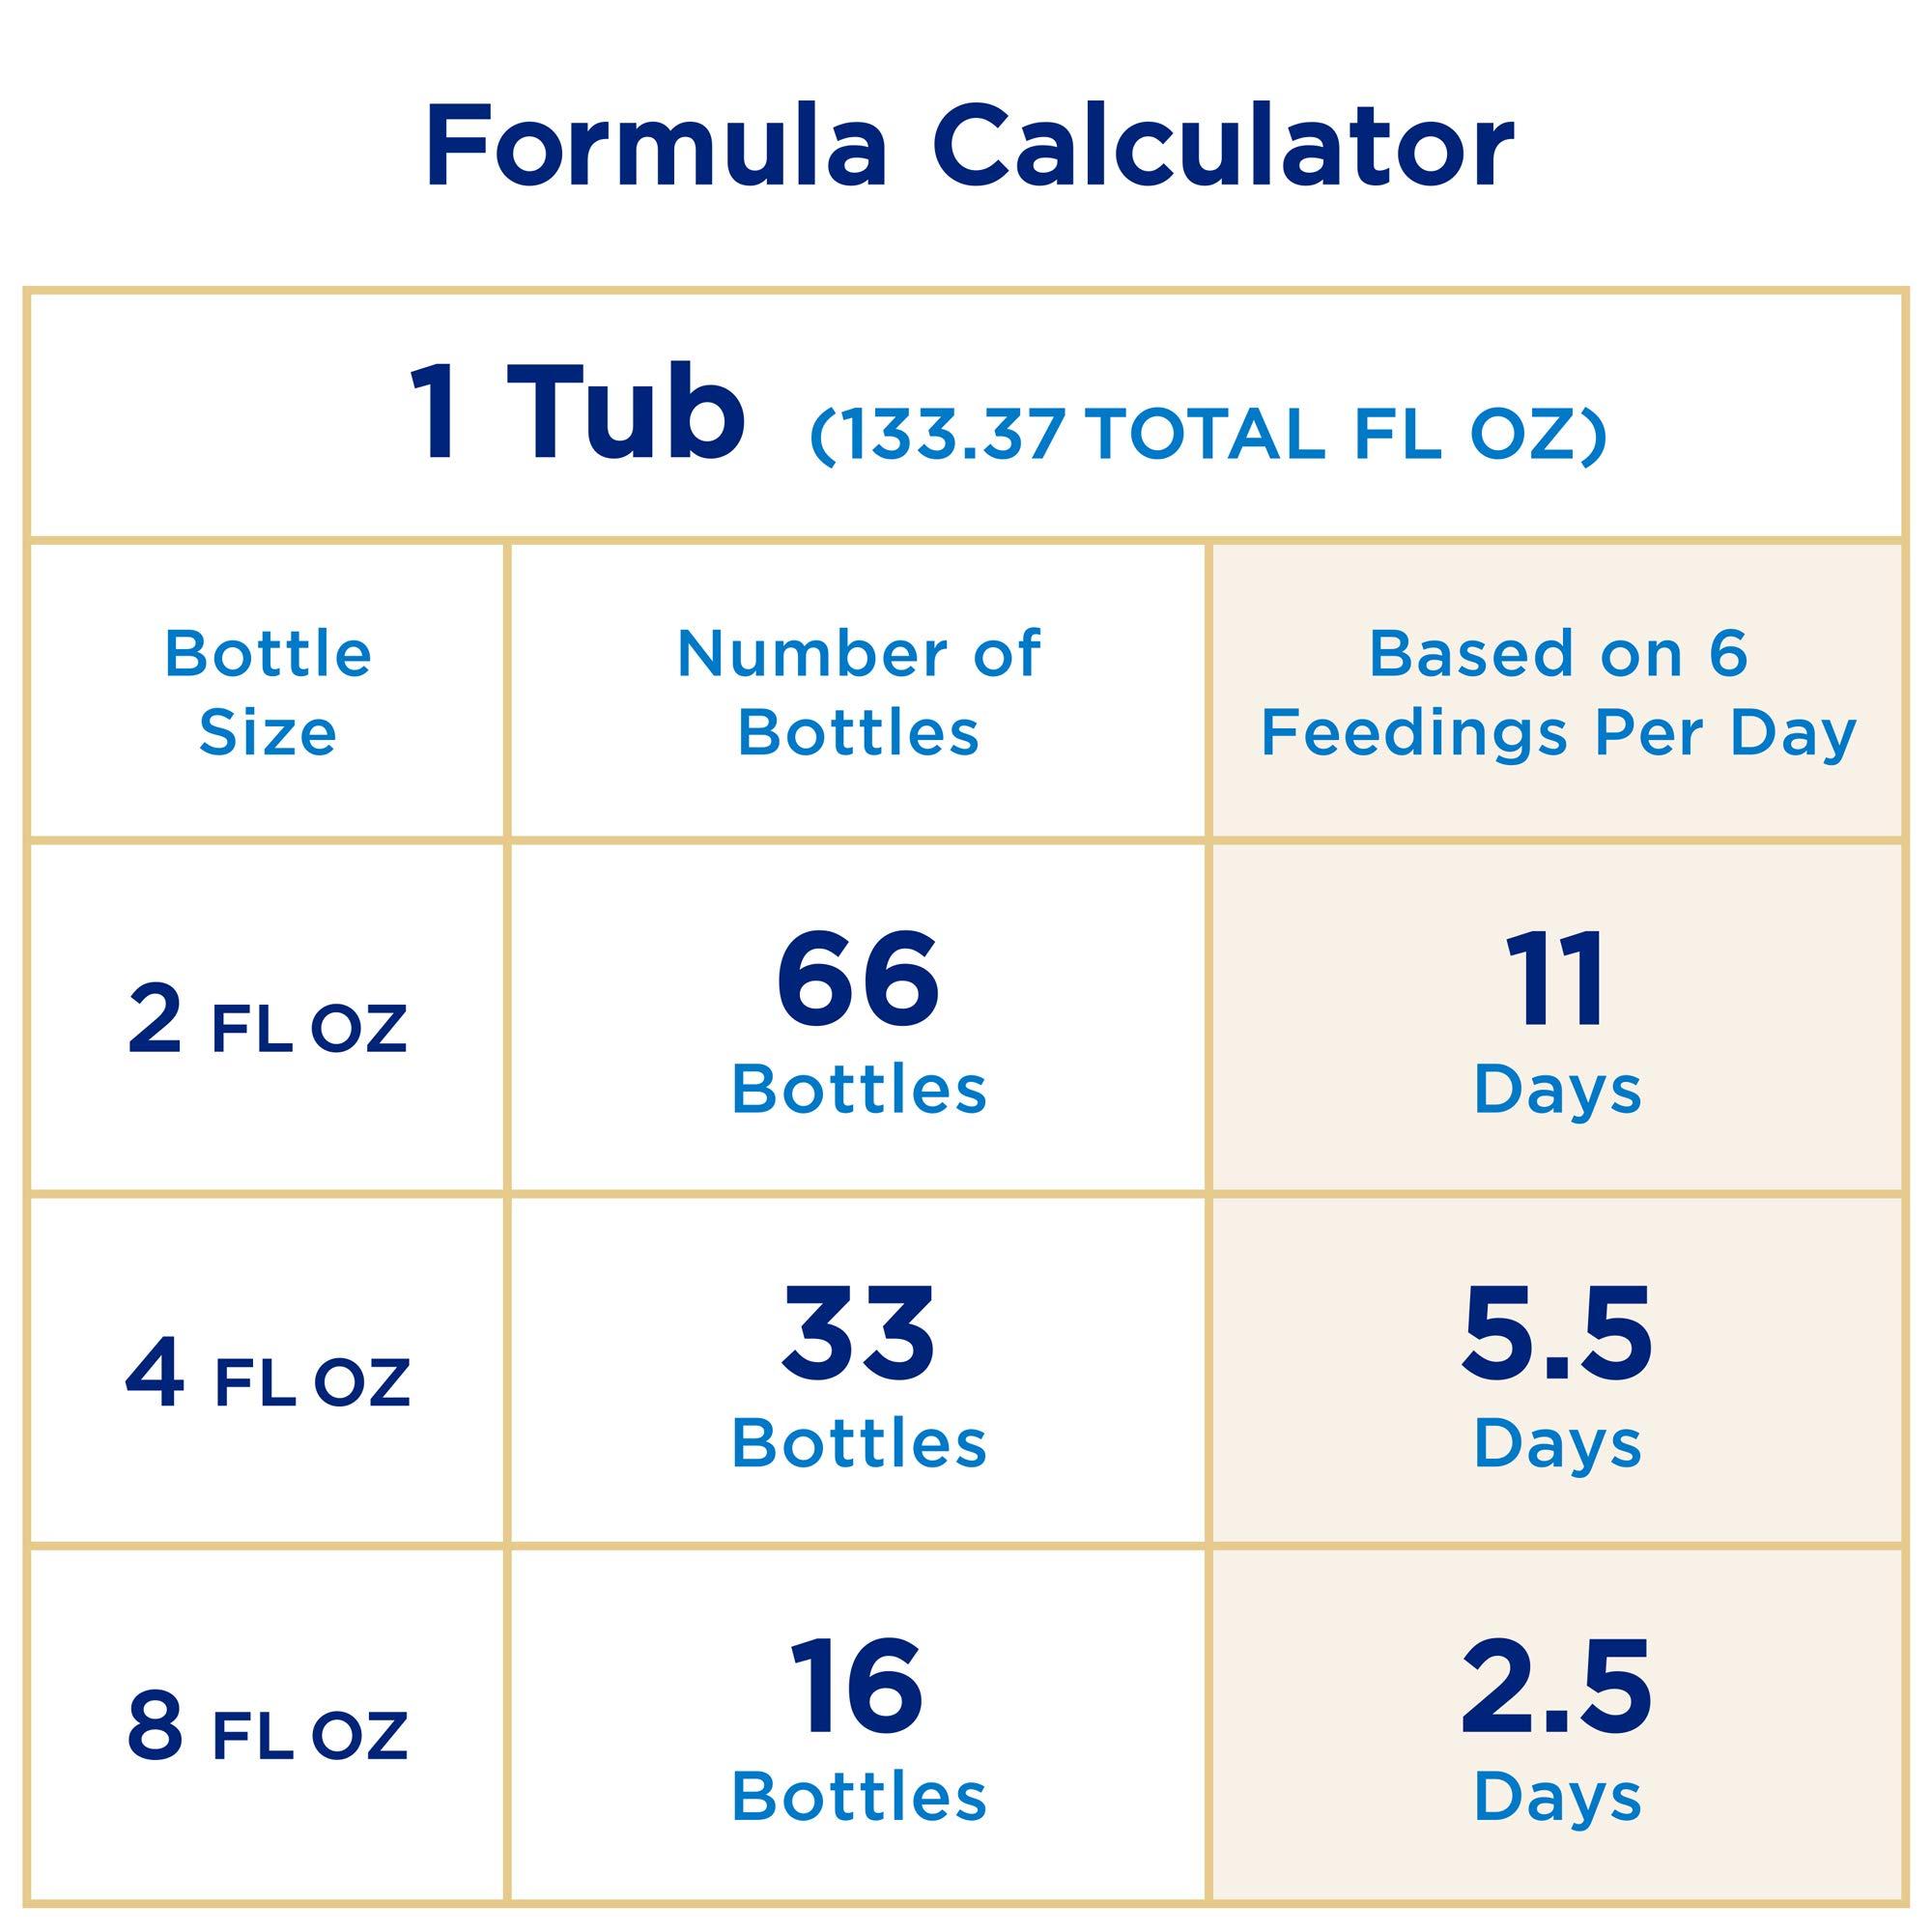 Enfamil NeuroPro Baby Formula Milk Powder, 20.7 Ounce (Pack of 6), Omega 3, Probiotics, Brain Support by Enfamil (Image #8)